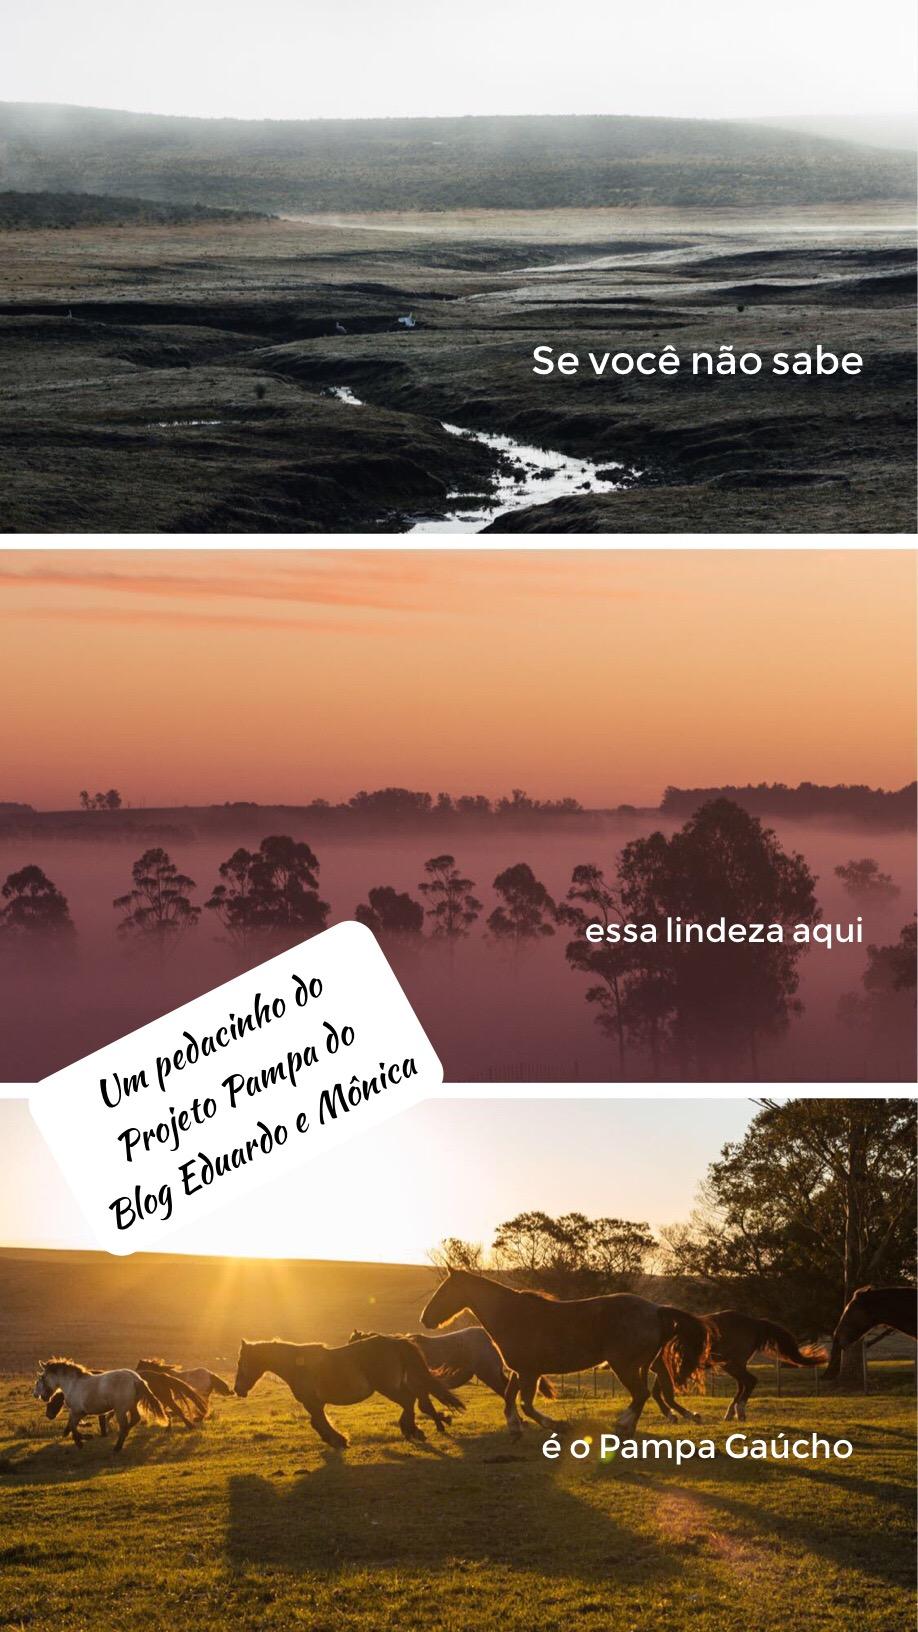 projeto pampa eduardo monica